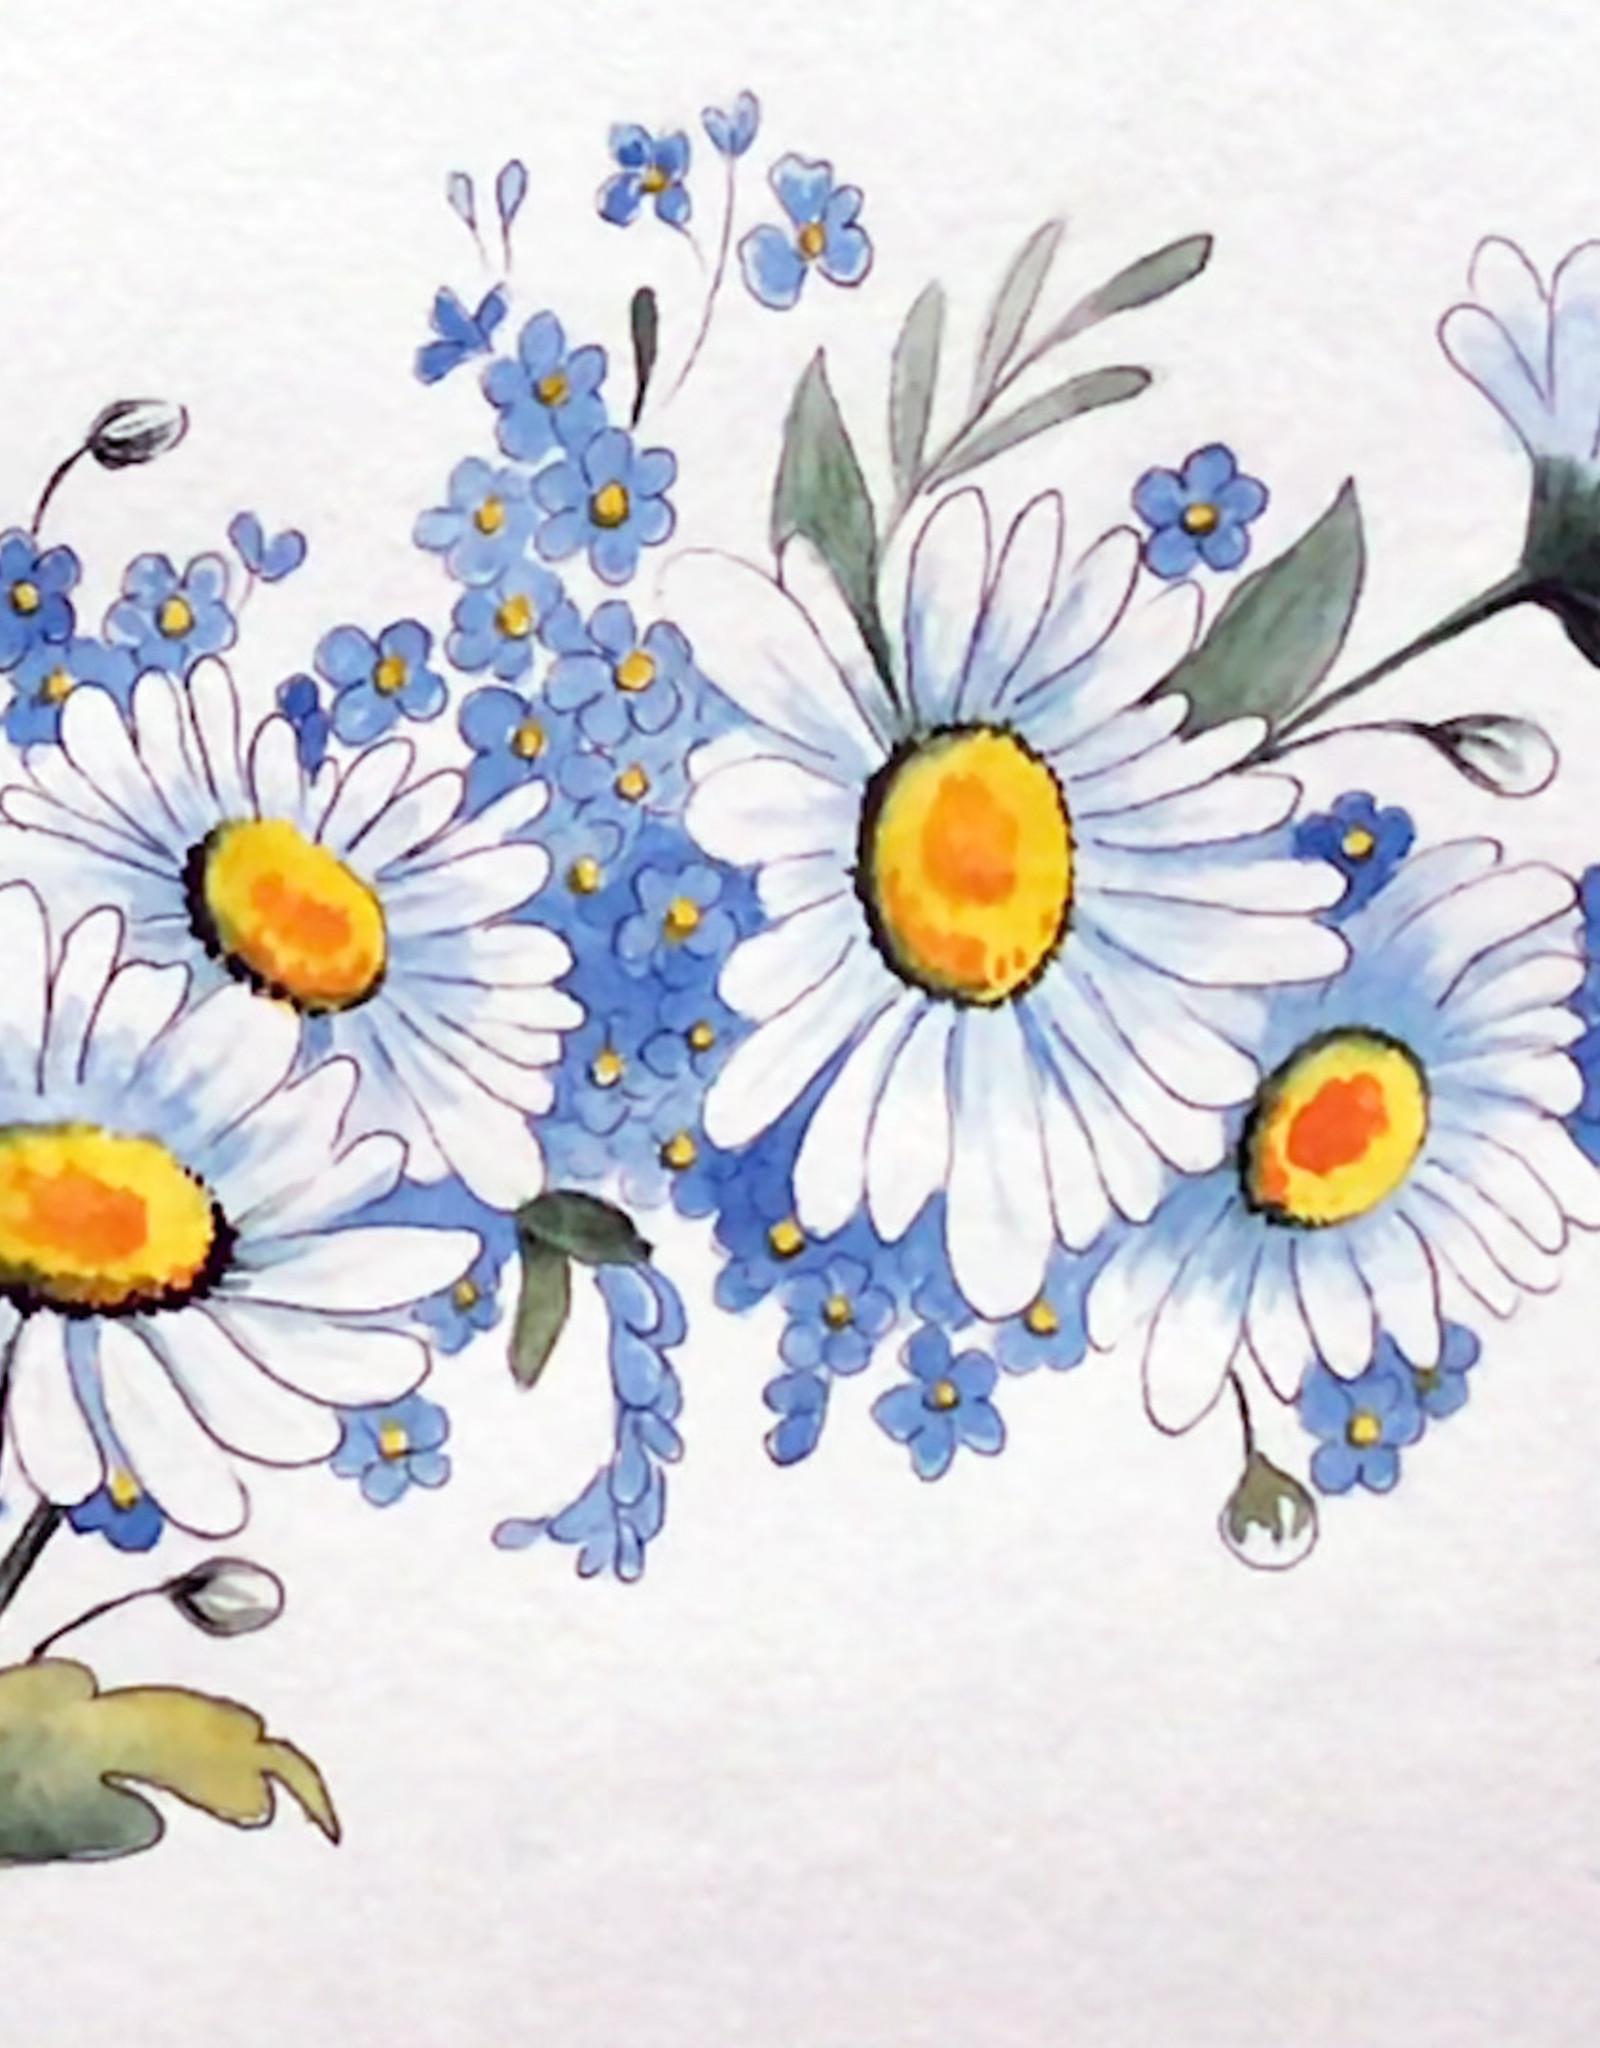 Tamara S Watercolour Art Class Daisies Wed March 10 2:00  to 4:00 pm